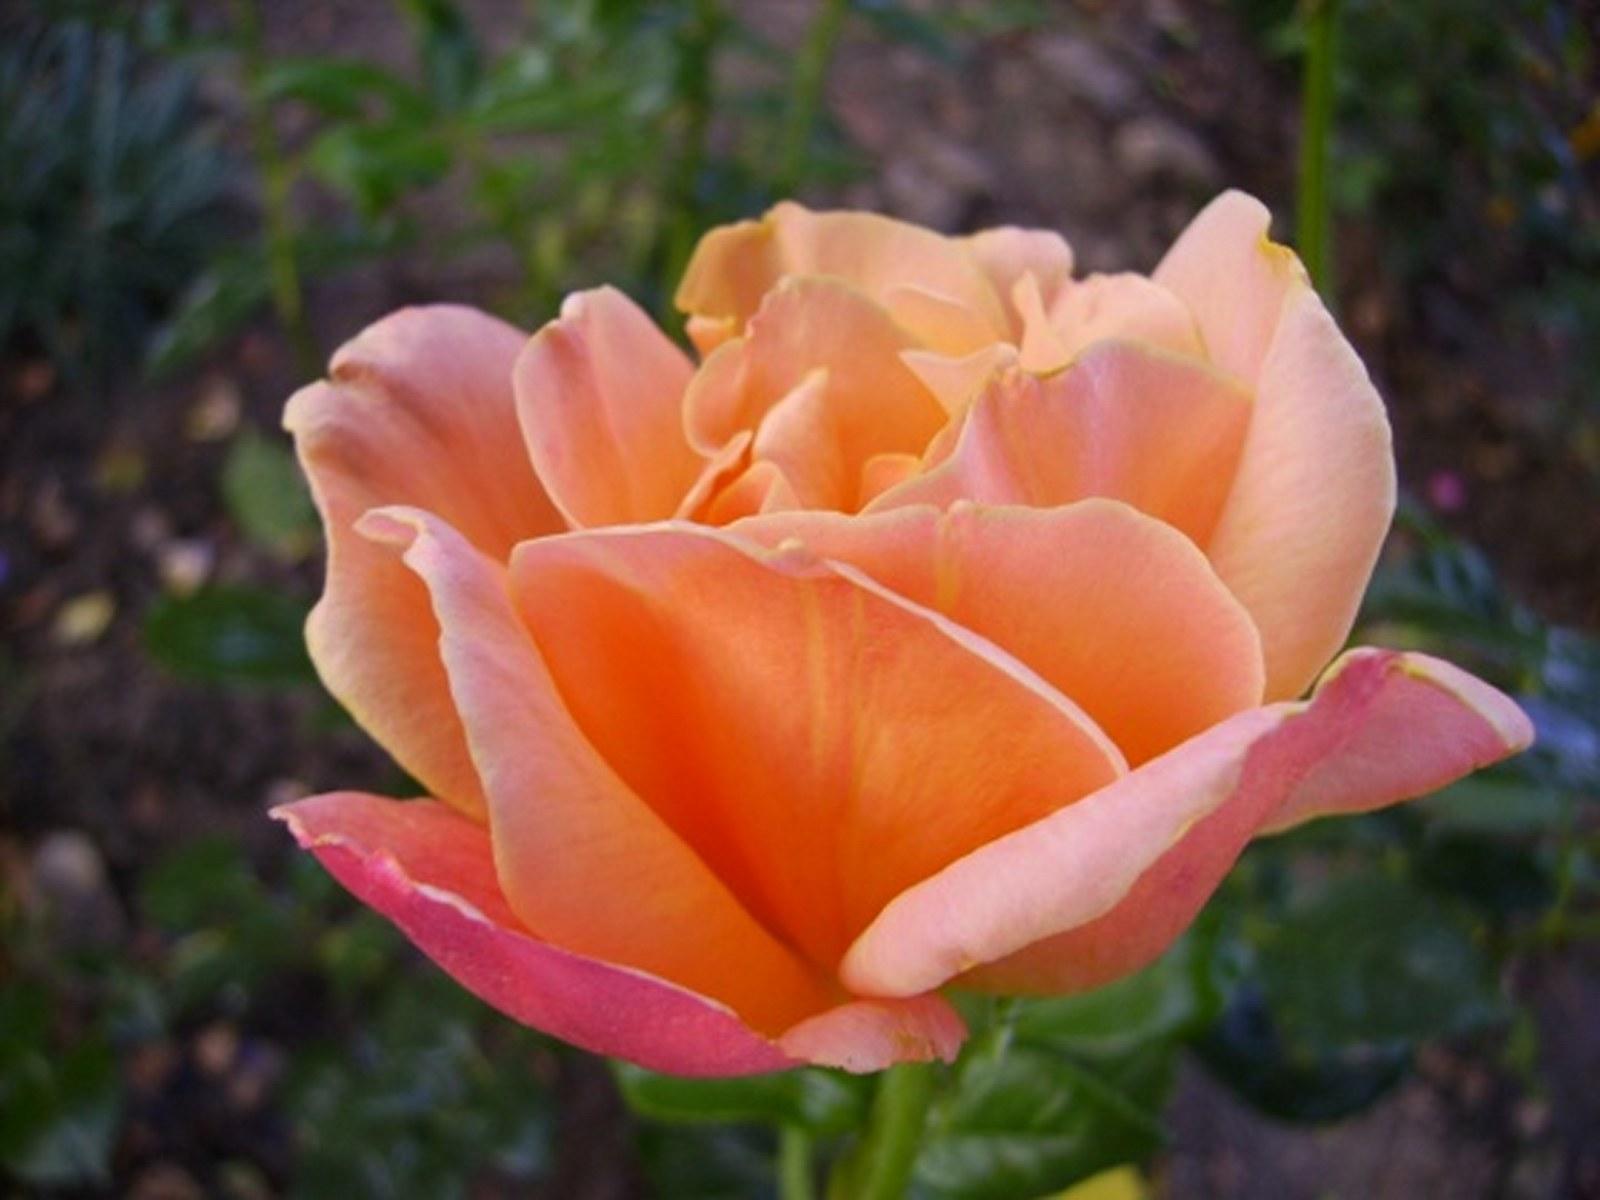 роза луи де фюнес картинки знал, что она